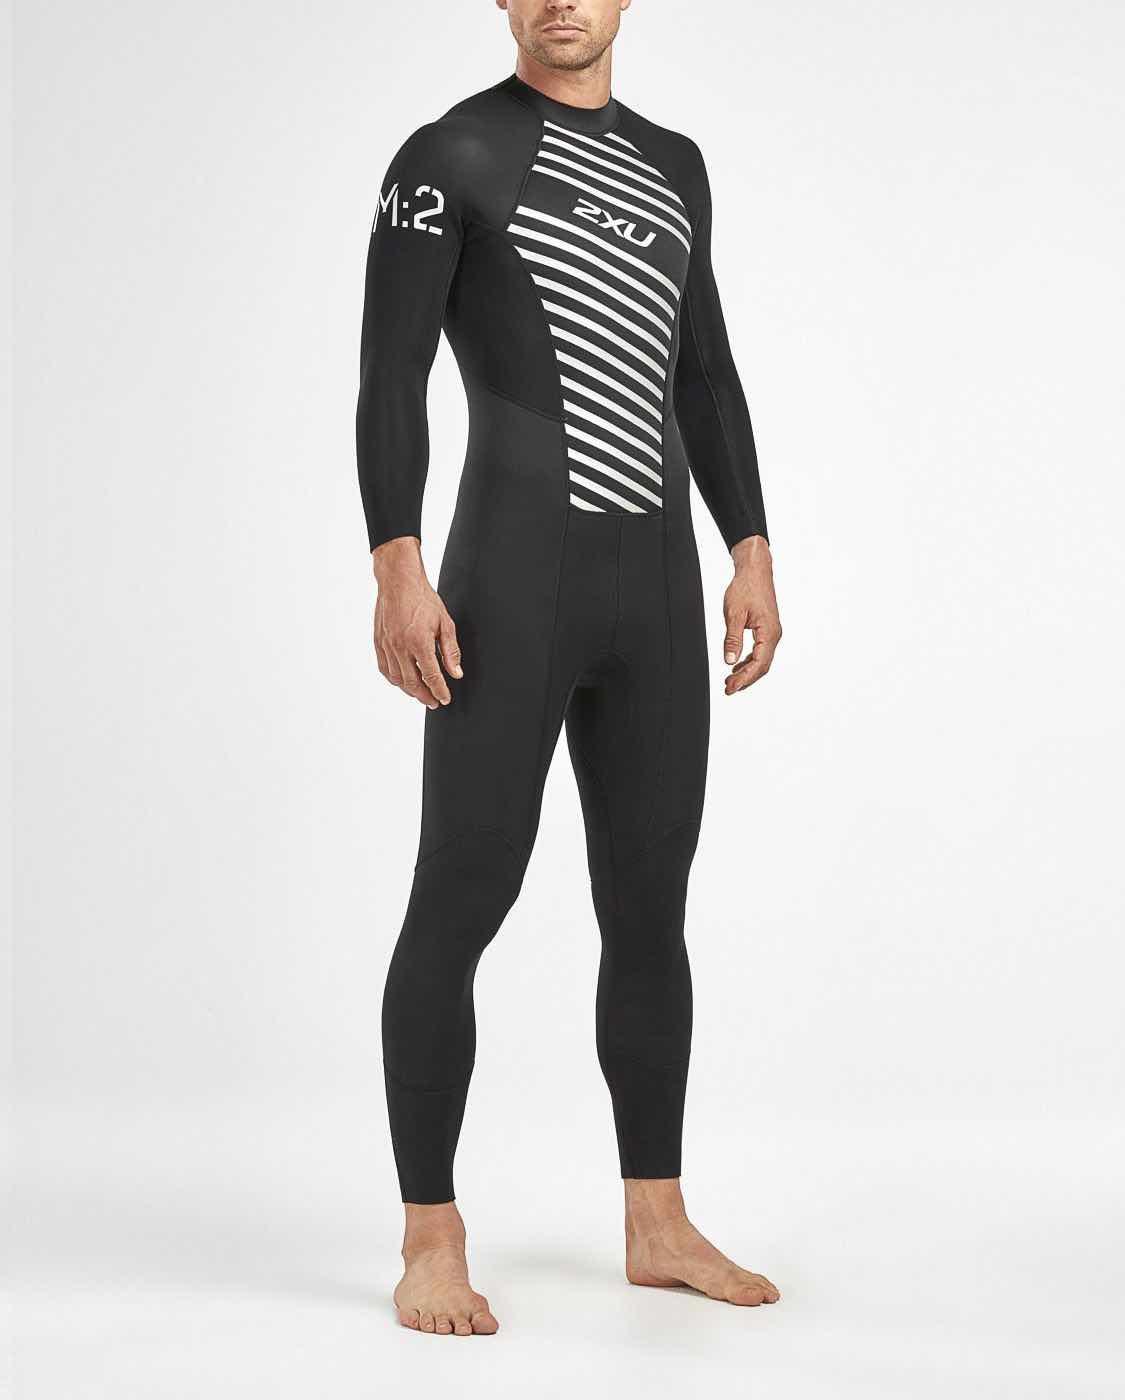 9878641ac 2XU M:2 Wetsuit M Black/Striped